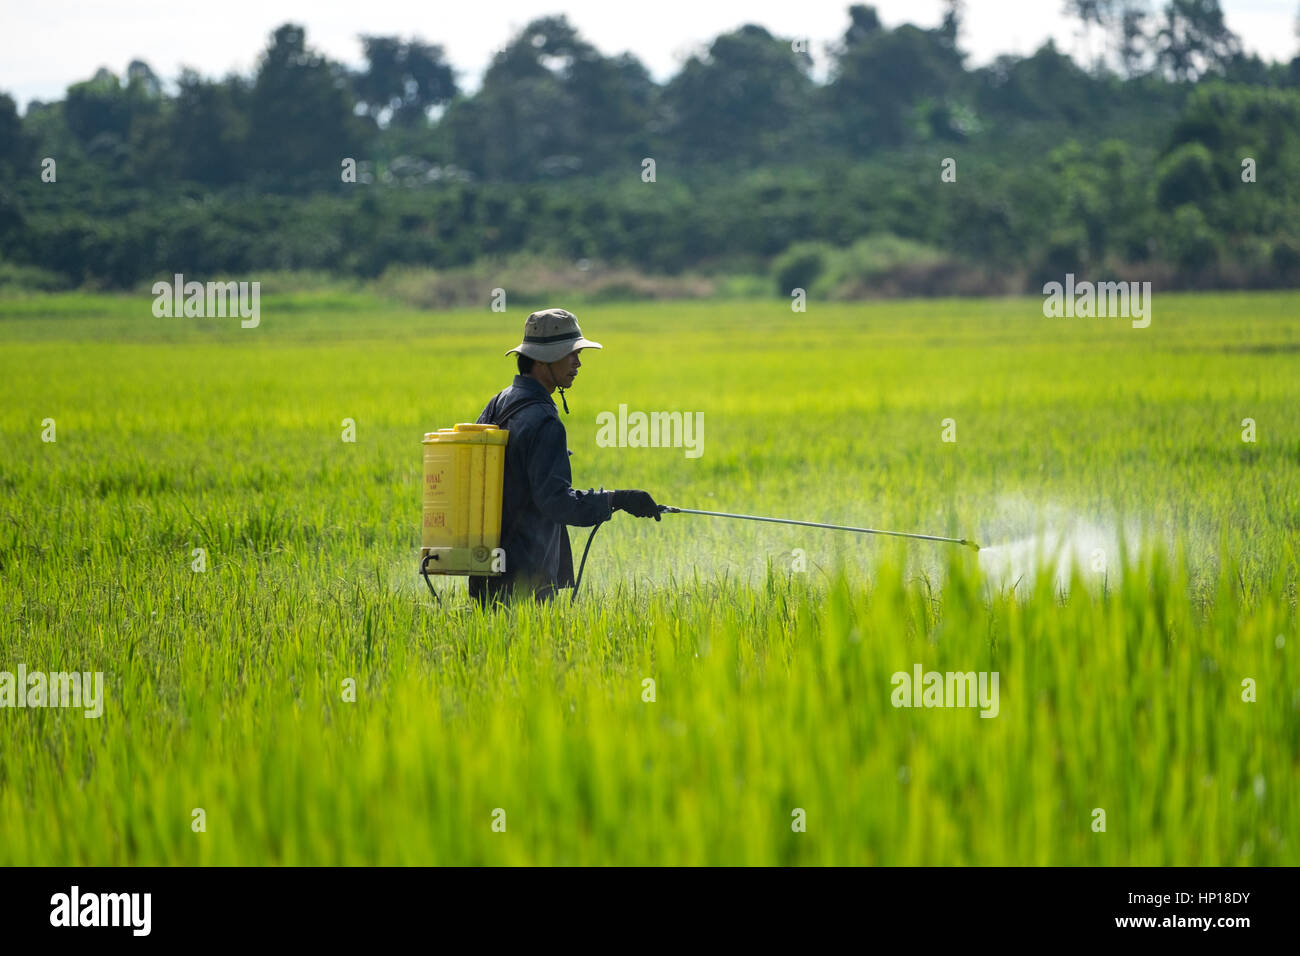 Farmer spraying pesticide on rice field - Stock Image